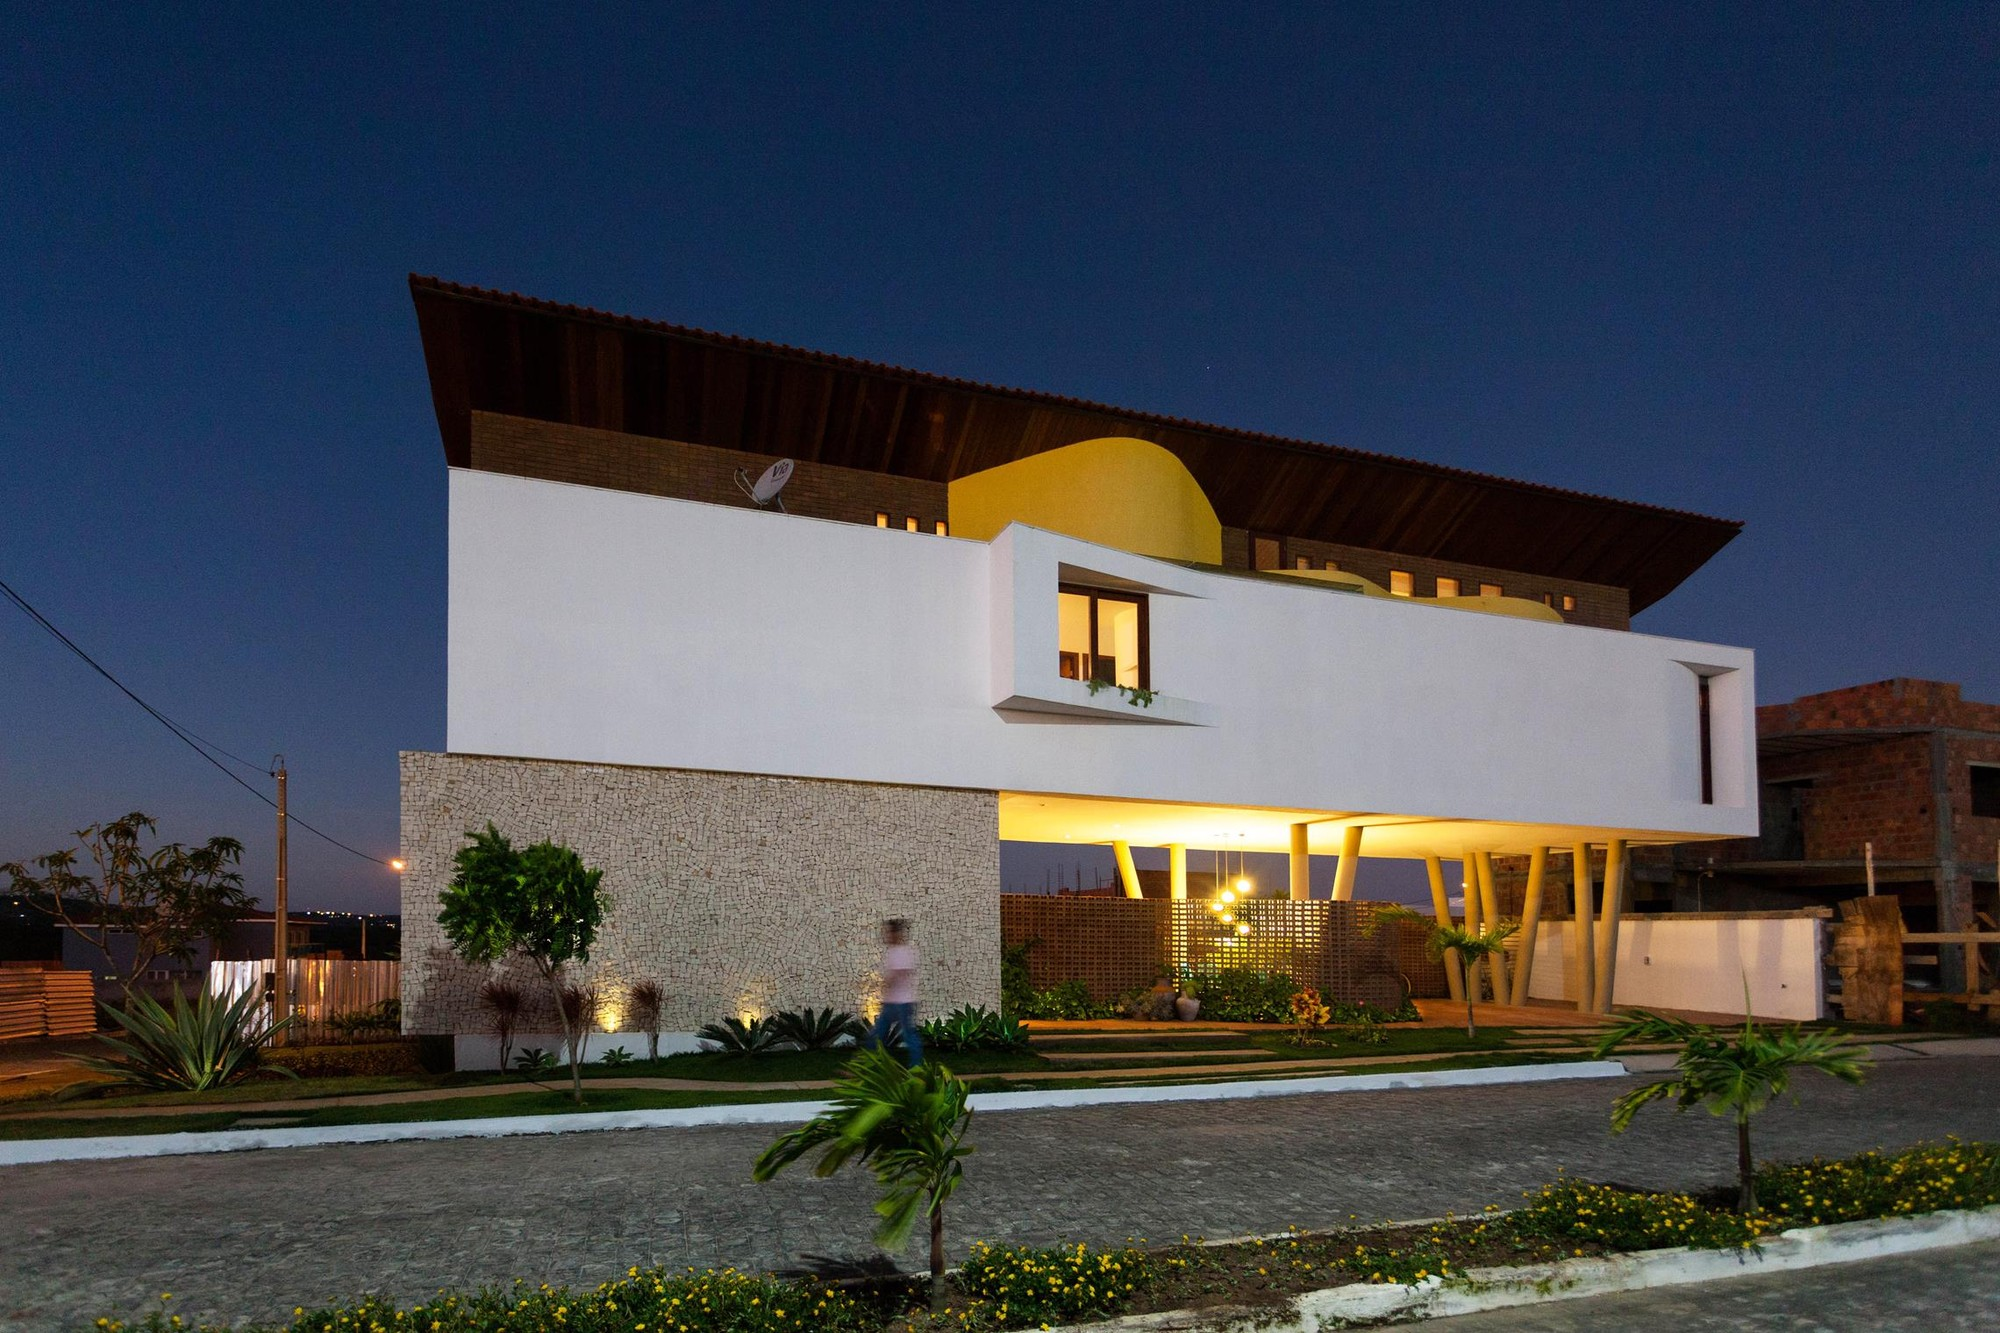 Architect's House / Jirau Arquitetura, © Antônio Preggo